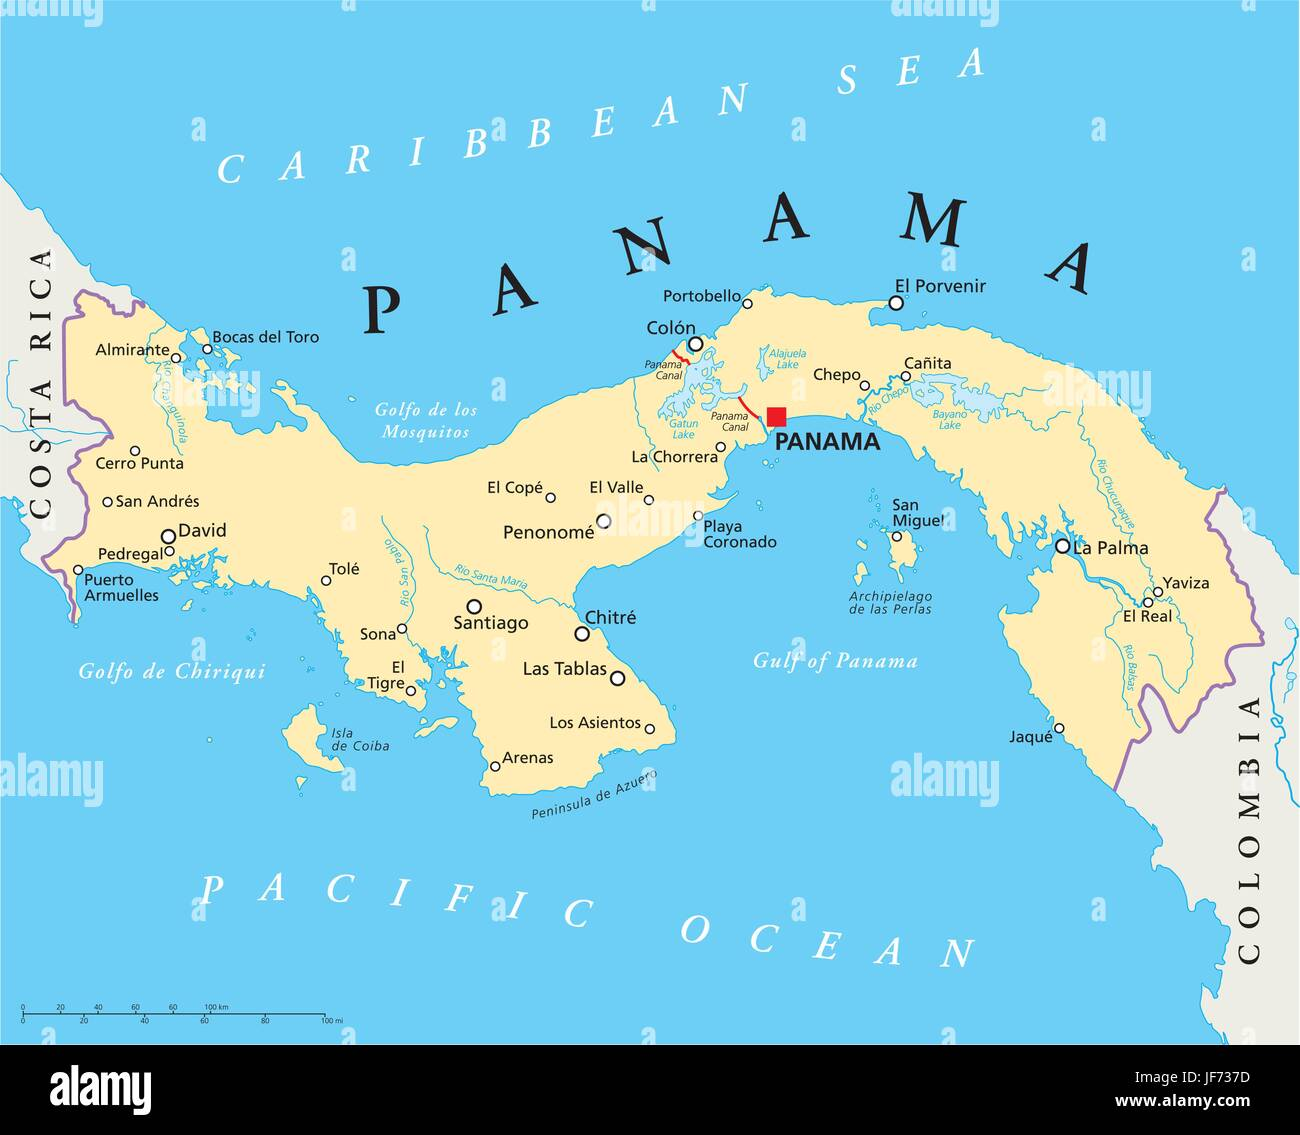 Panamakanal Route Stockfotos Und Bilder Kaufen Alamy